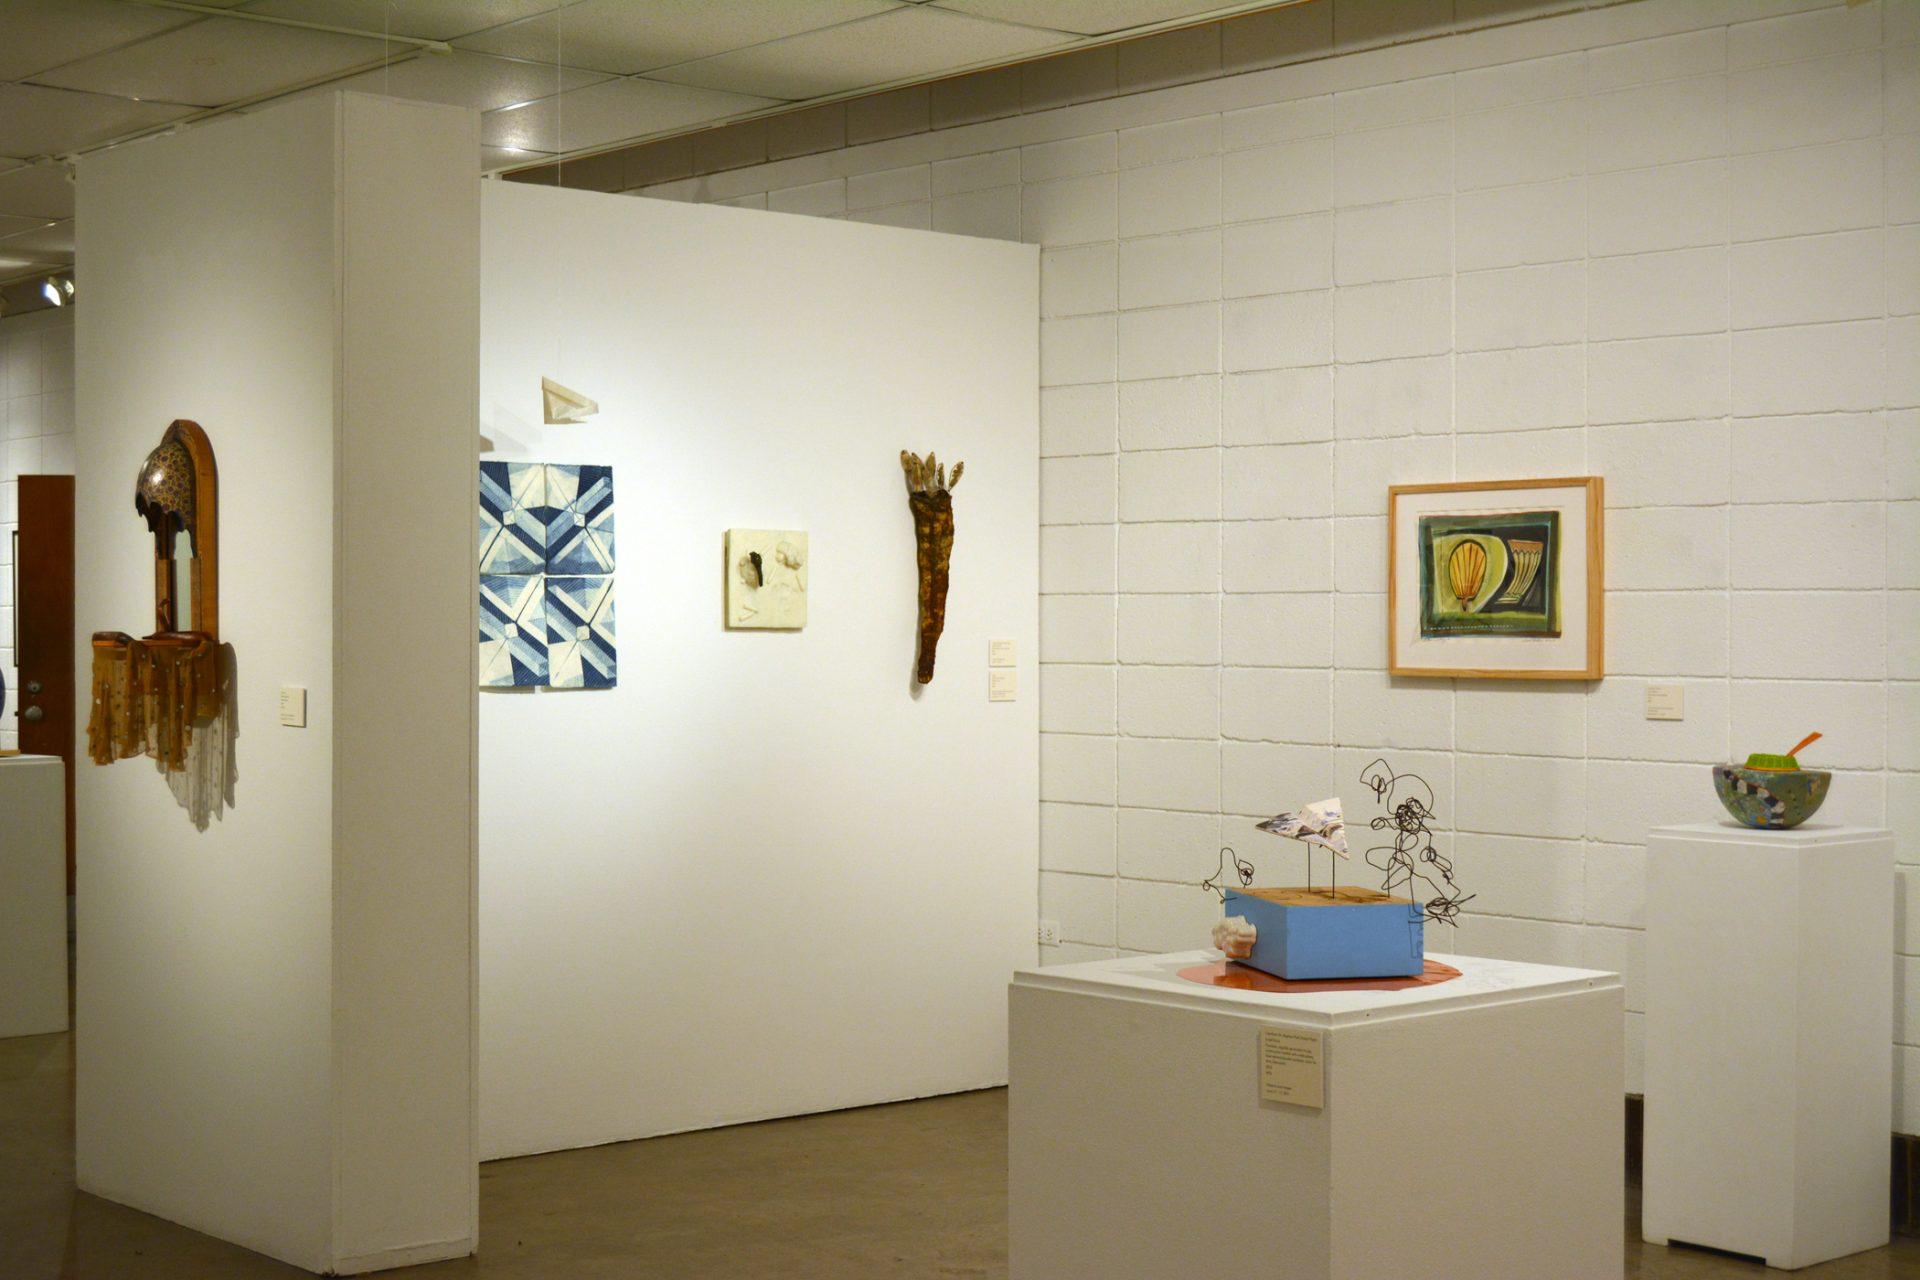 2017 instructor exhibition arrowmont school of arts and for Arrowmont school of arts and crafts